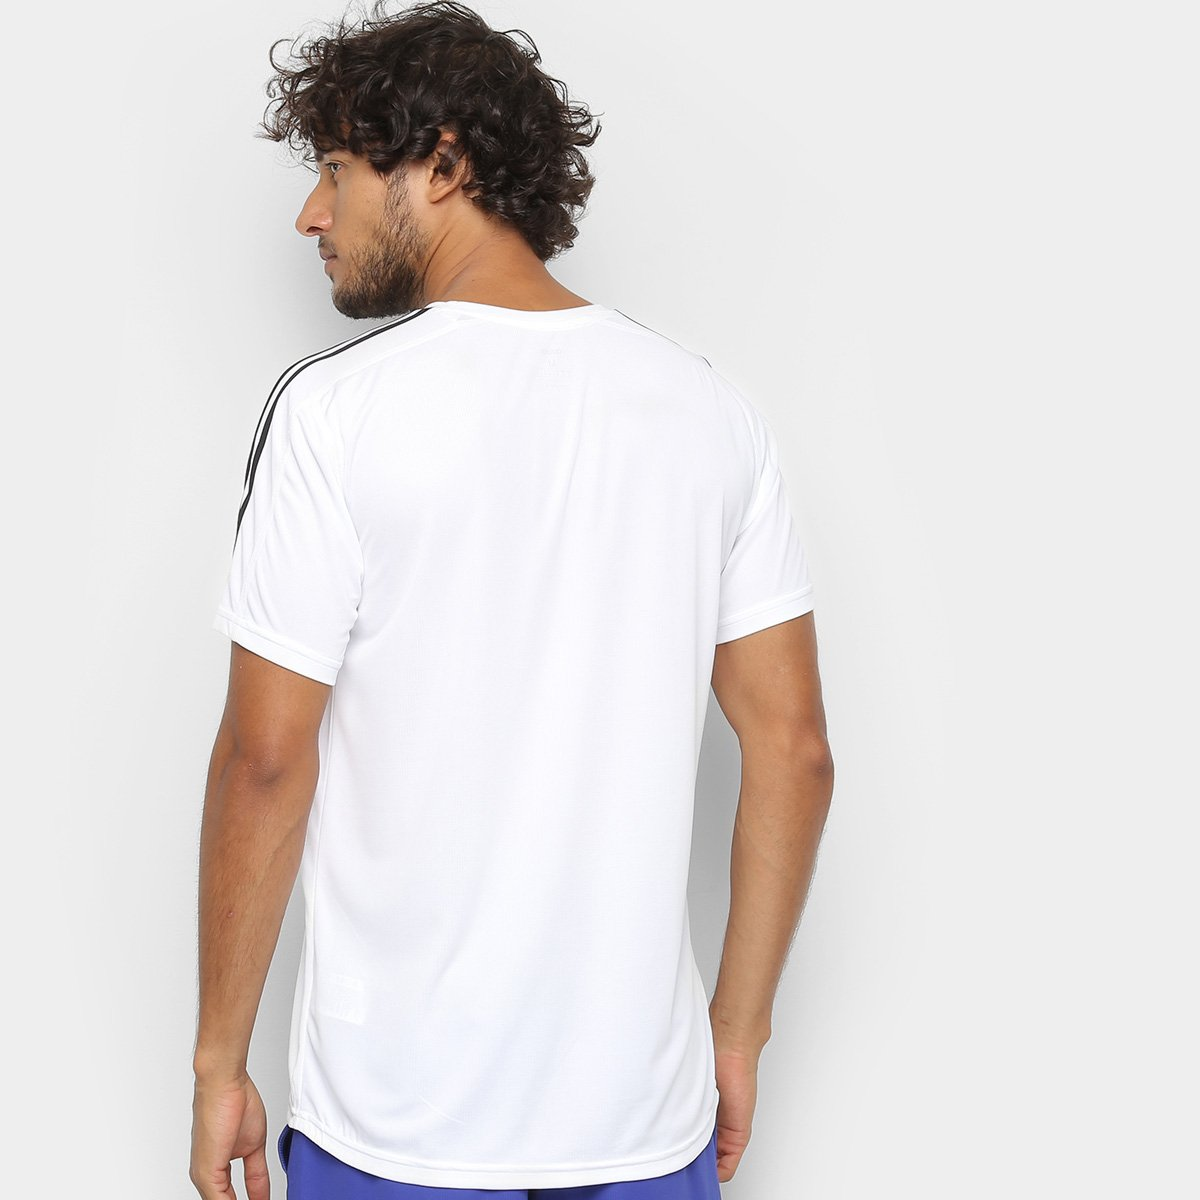 Camiseta Adidas Design 2 Move 3 Stripes Masculina - Branco - Compre ... 9406c3e25df